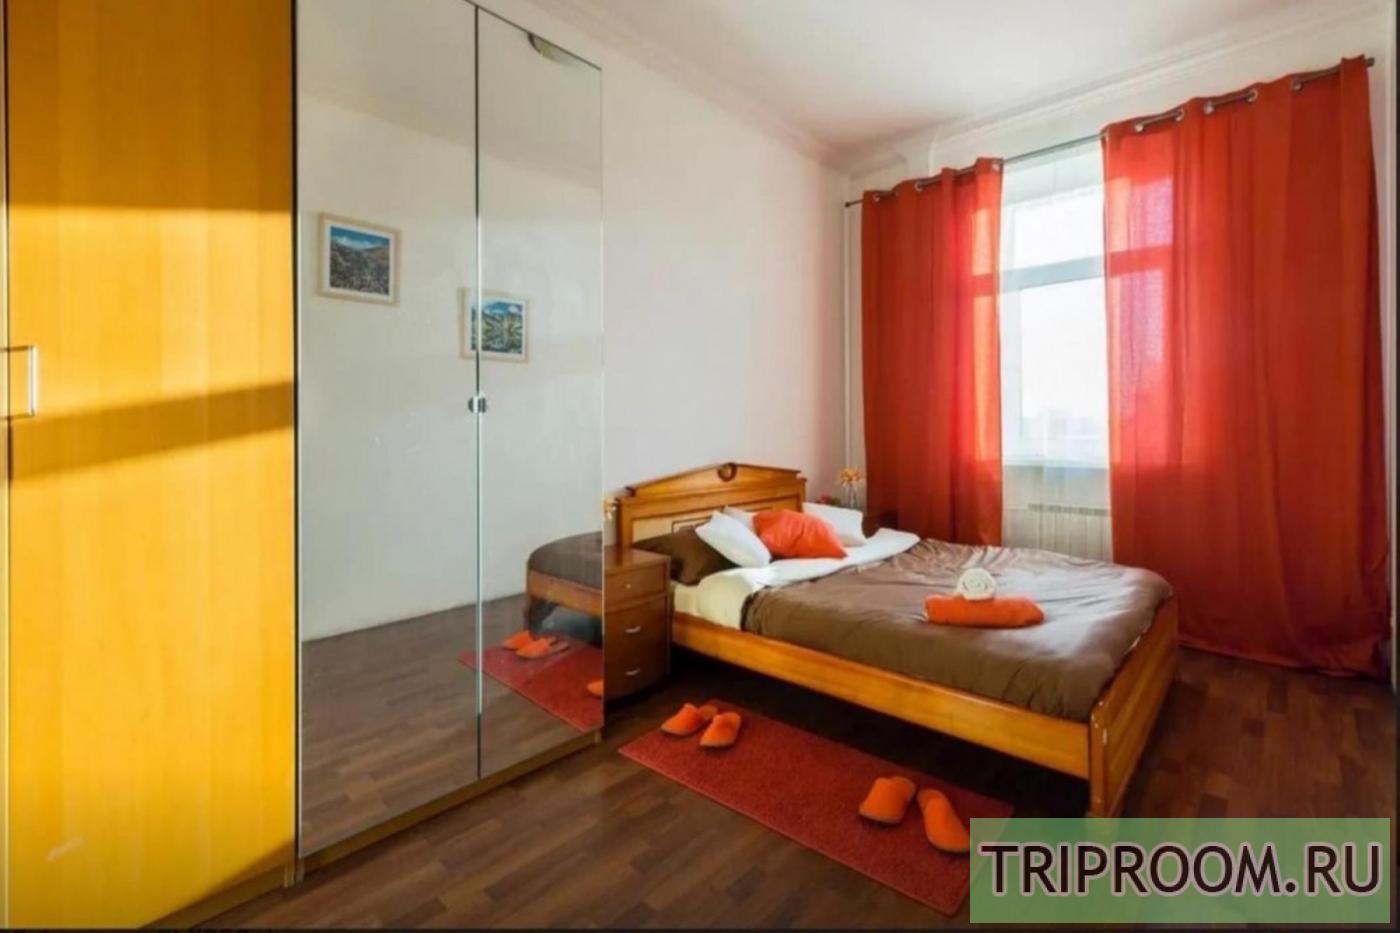 1-комнатная квартира посуточно (вариант № 33441), ул. проспект Соколова, фото № 1